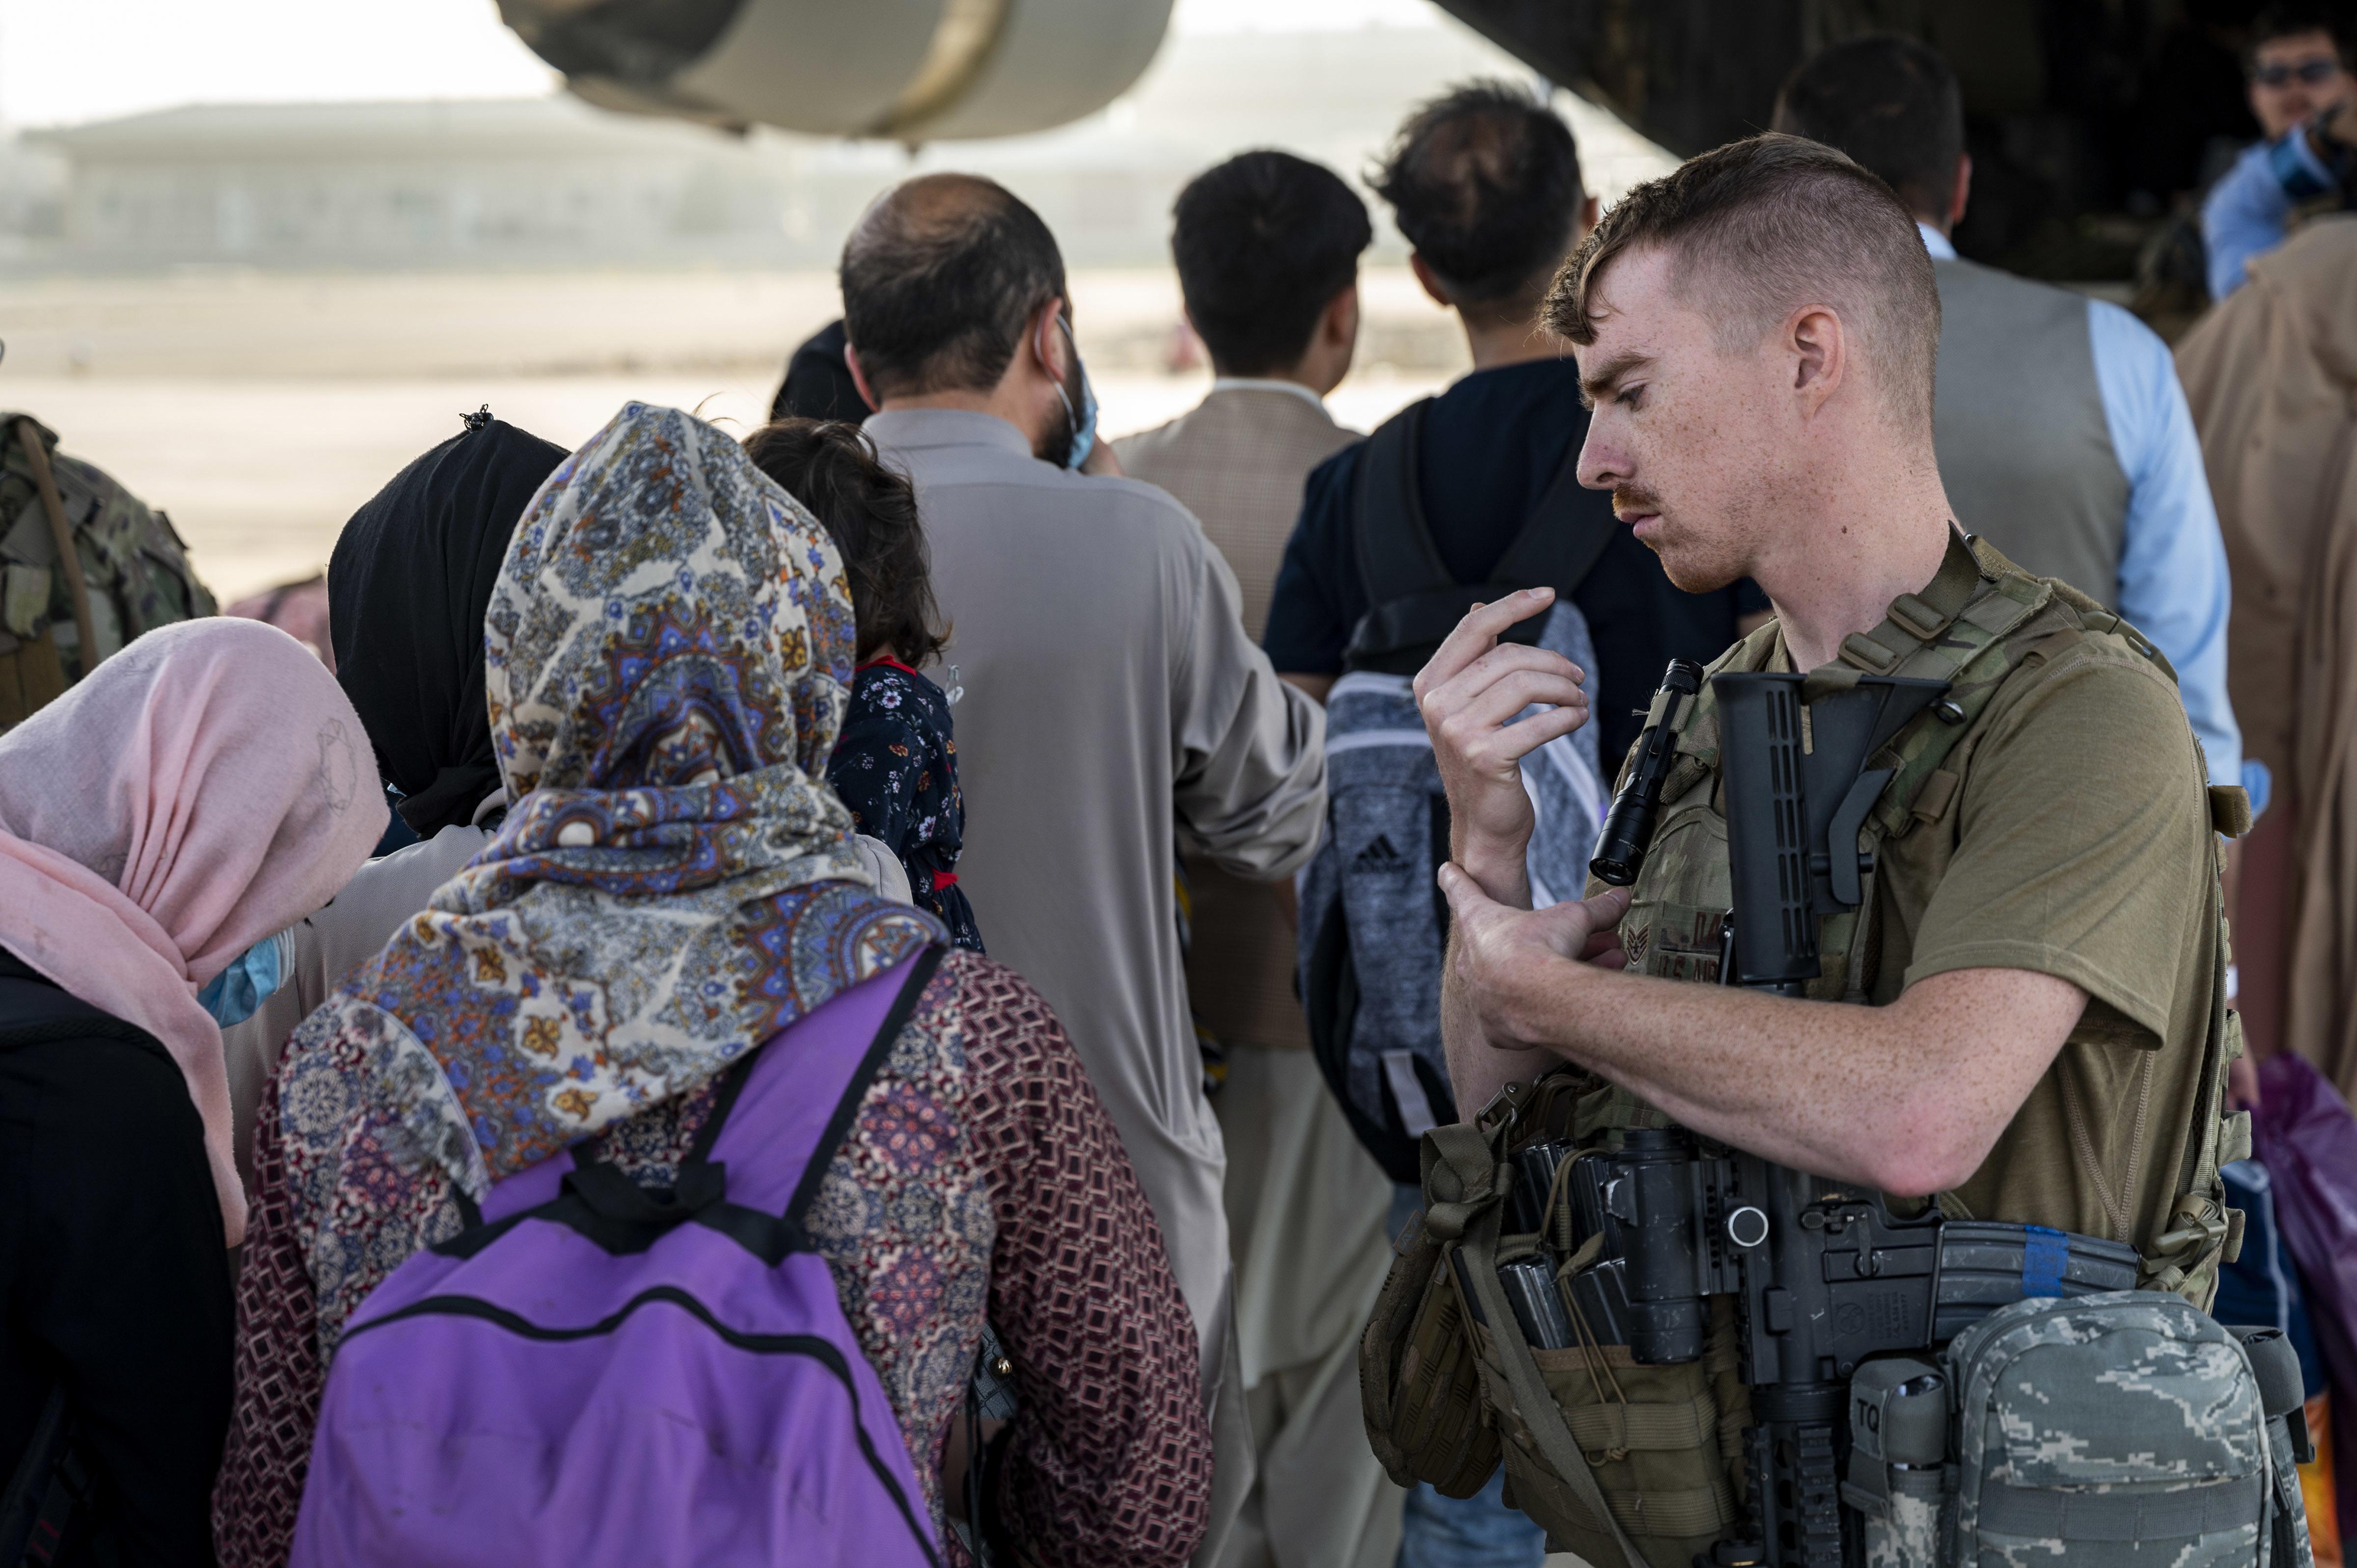 A U.S. airman helps evacuees board a military airplane in Afghanistan.